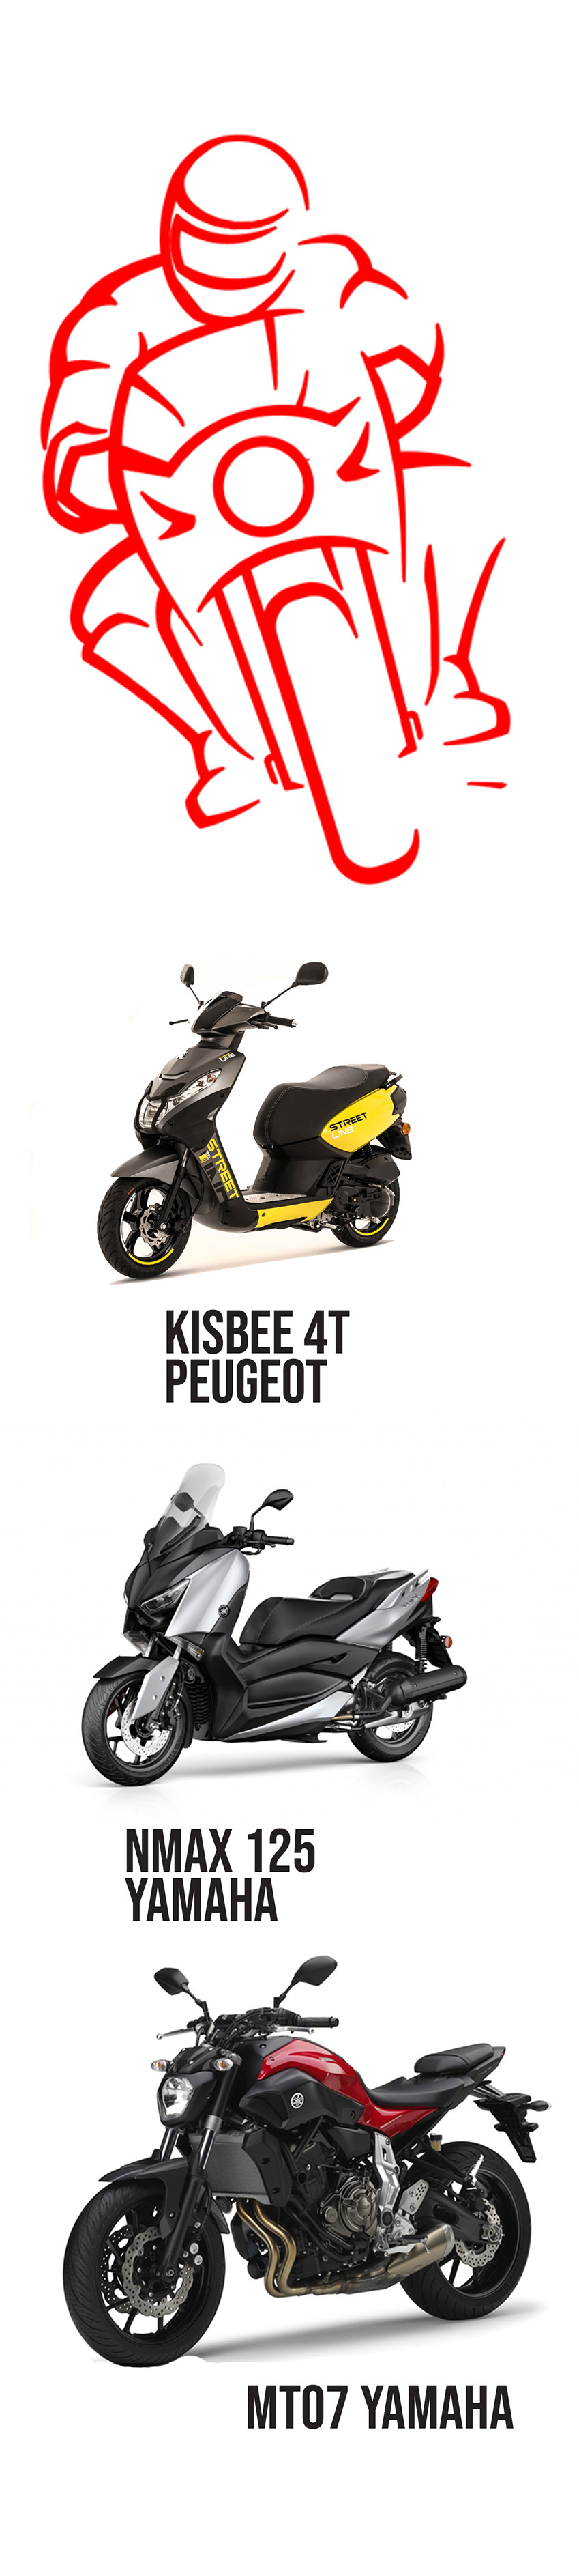 Promo permis moto